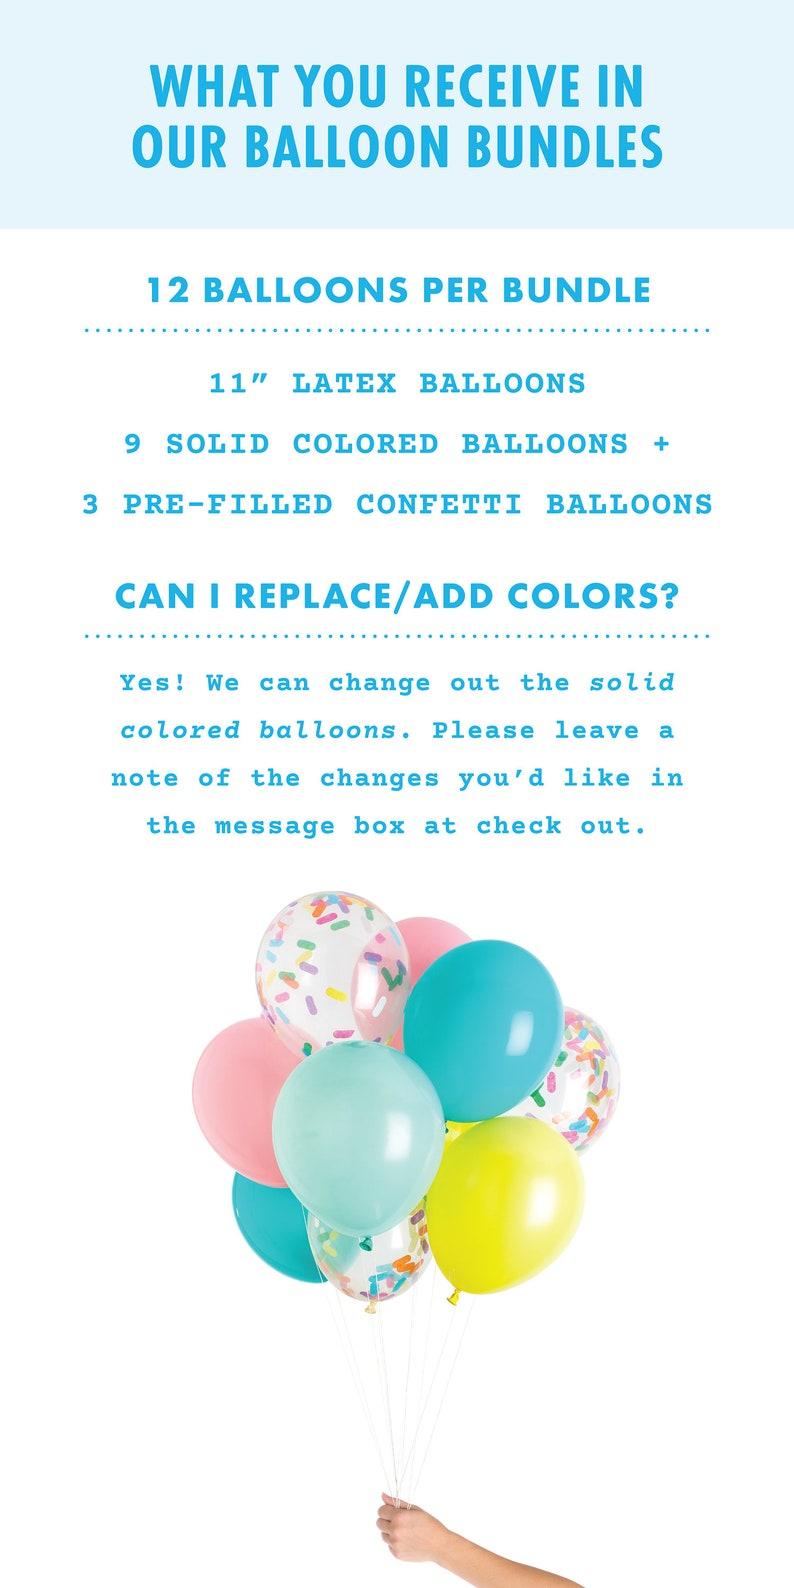 Carousel Balloons includes 3 pre-filled confetti balloons 12 Balloons